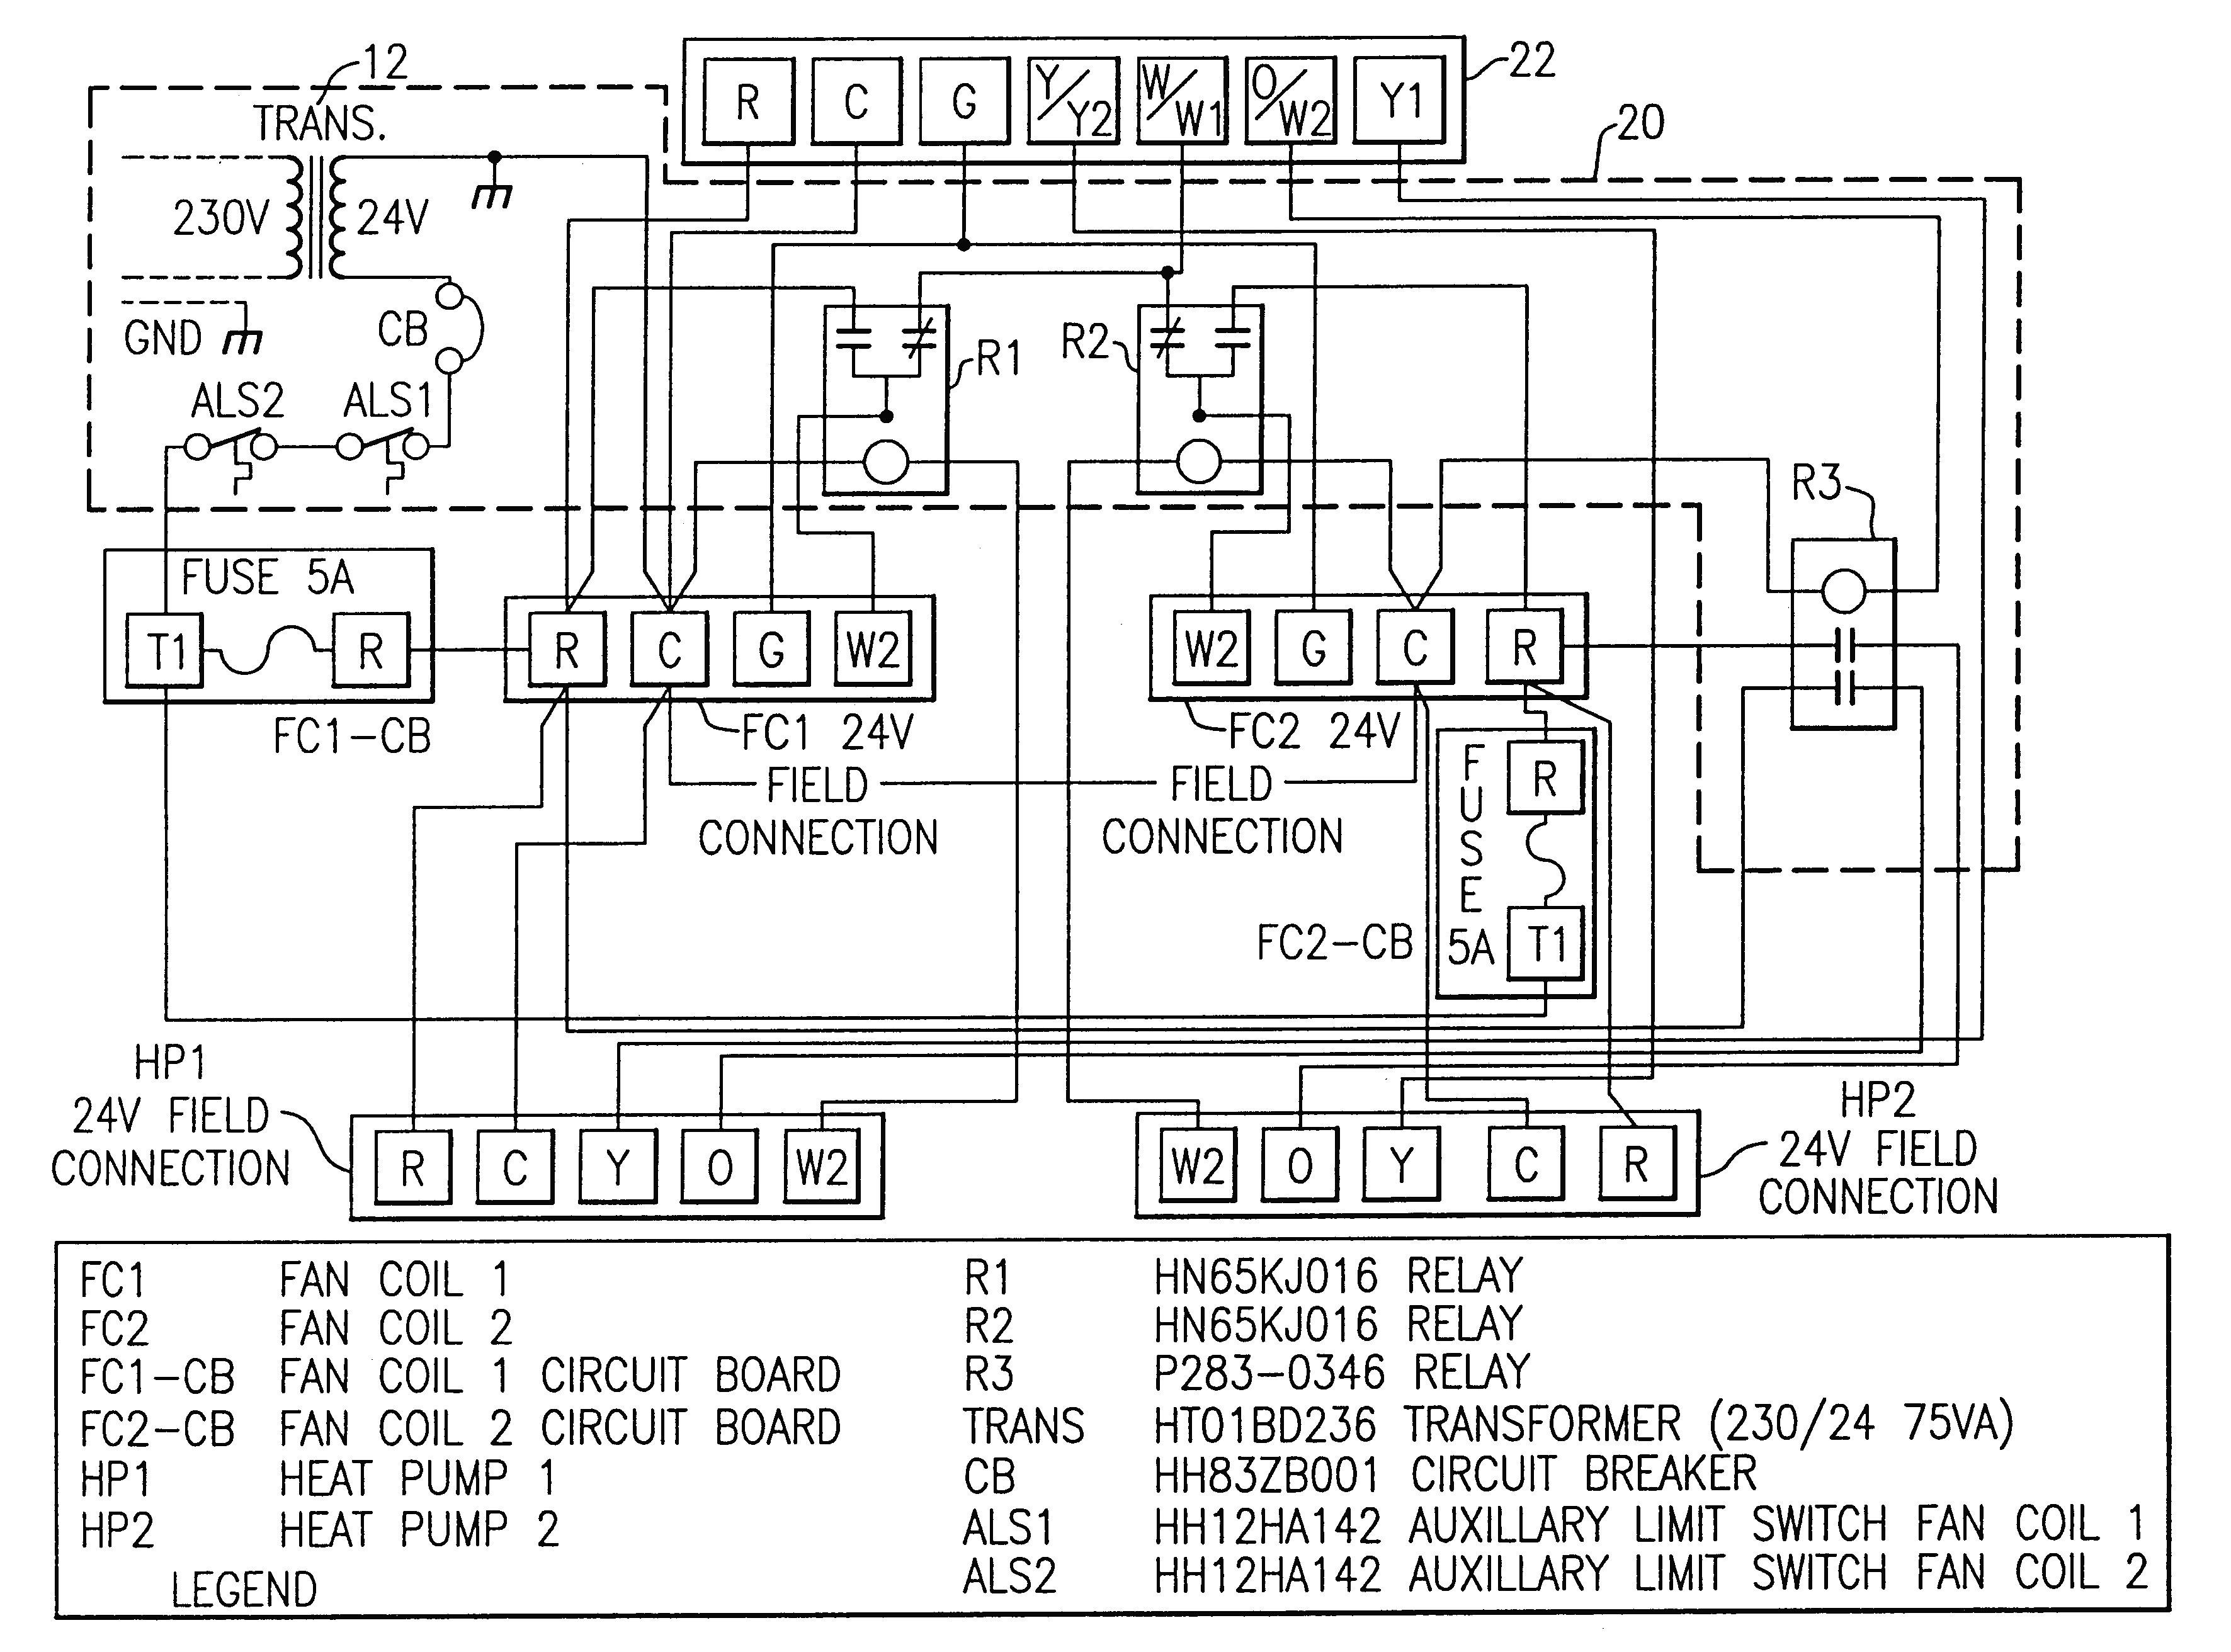 Goodman Gas Furnace Wiring Diagram from www.adinaporter.com